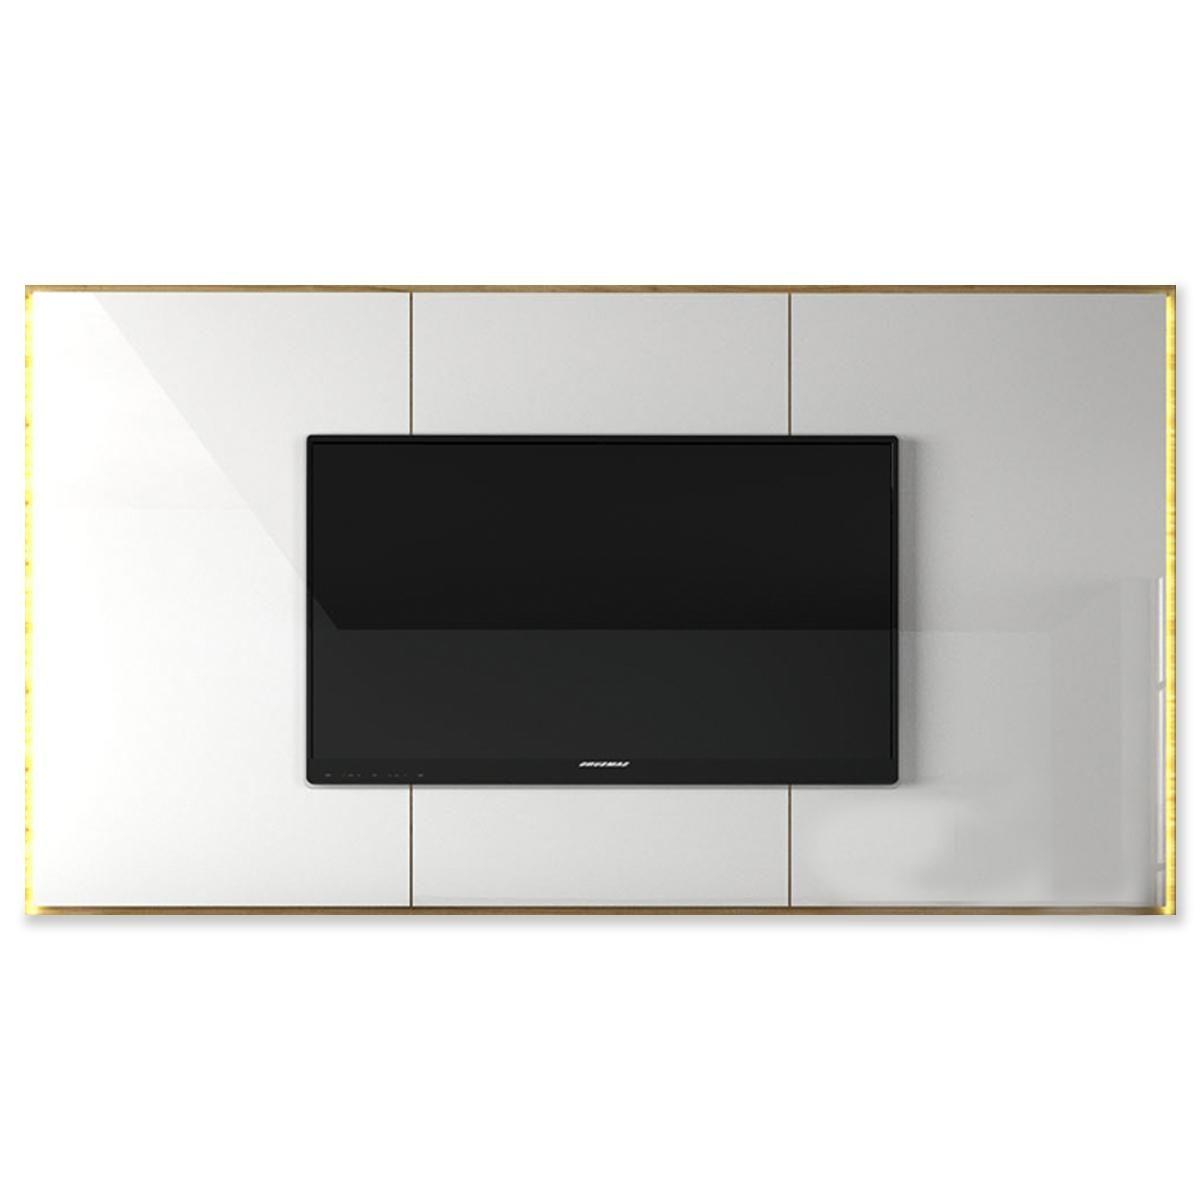 Painel California 2000mm - Cinamomo/Branco Brilho - KNR Decor